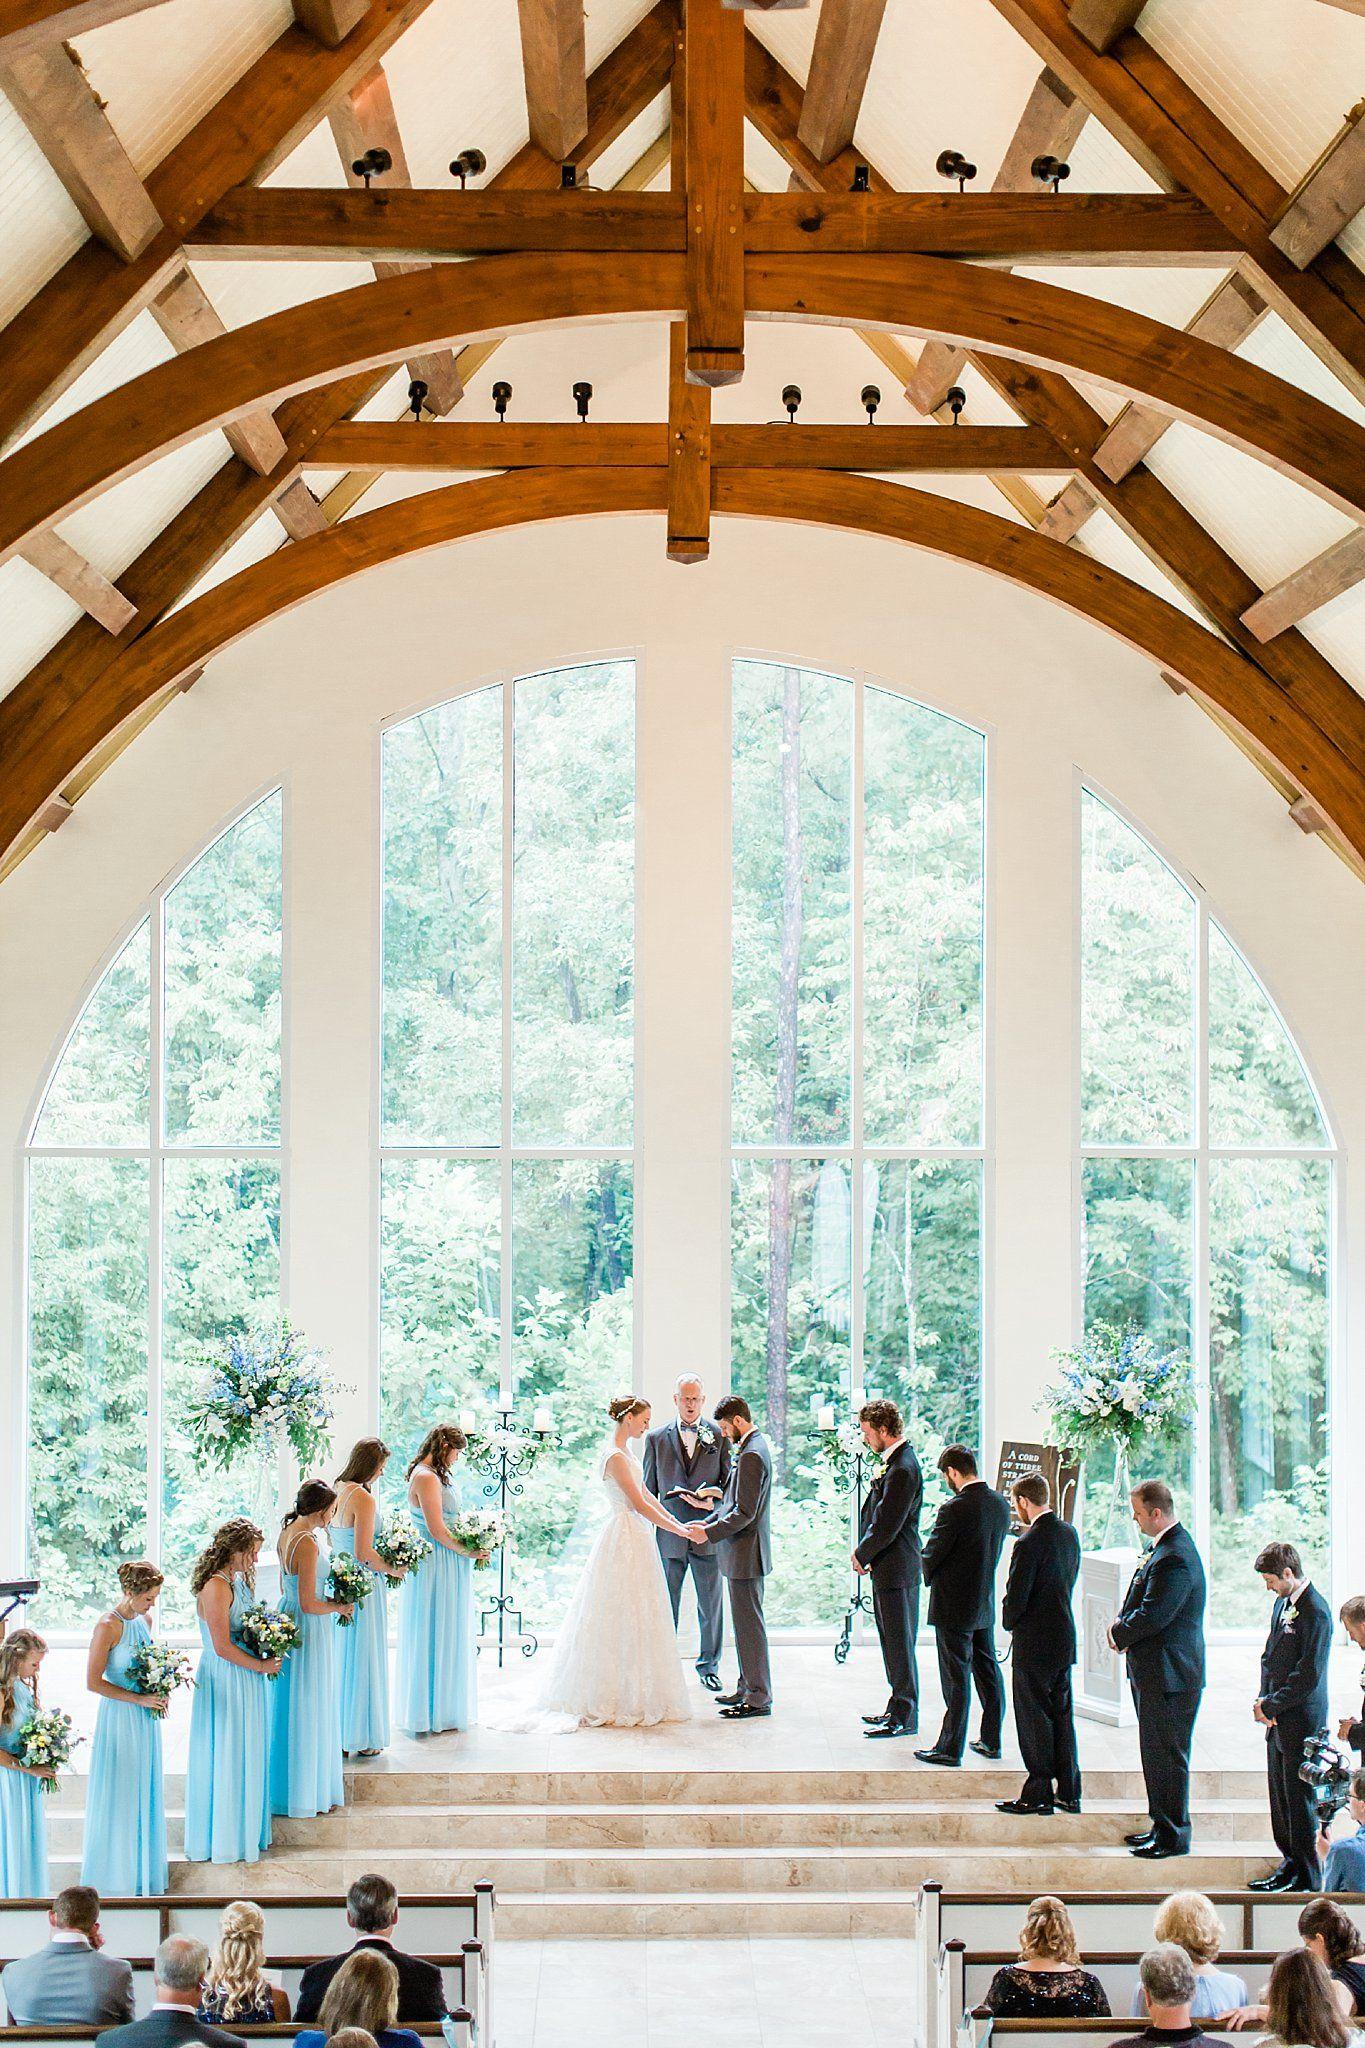 Gorgeous Indoor Wedding Ceremony At Ashton Gardens In Atlanta Ga Fine Art Film Photographer In 2020 Atlanta Wedding Venues Indoor Wedding Indoor Wedding Ceremonies